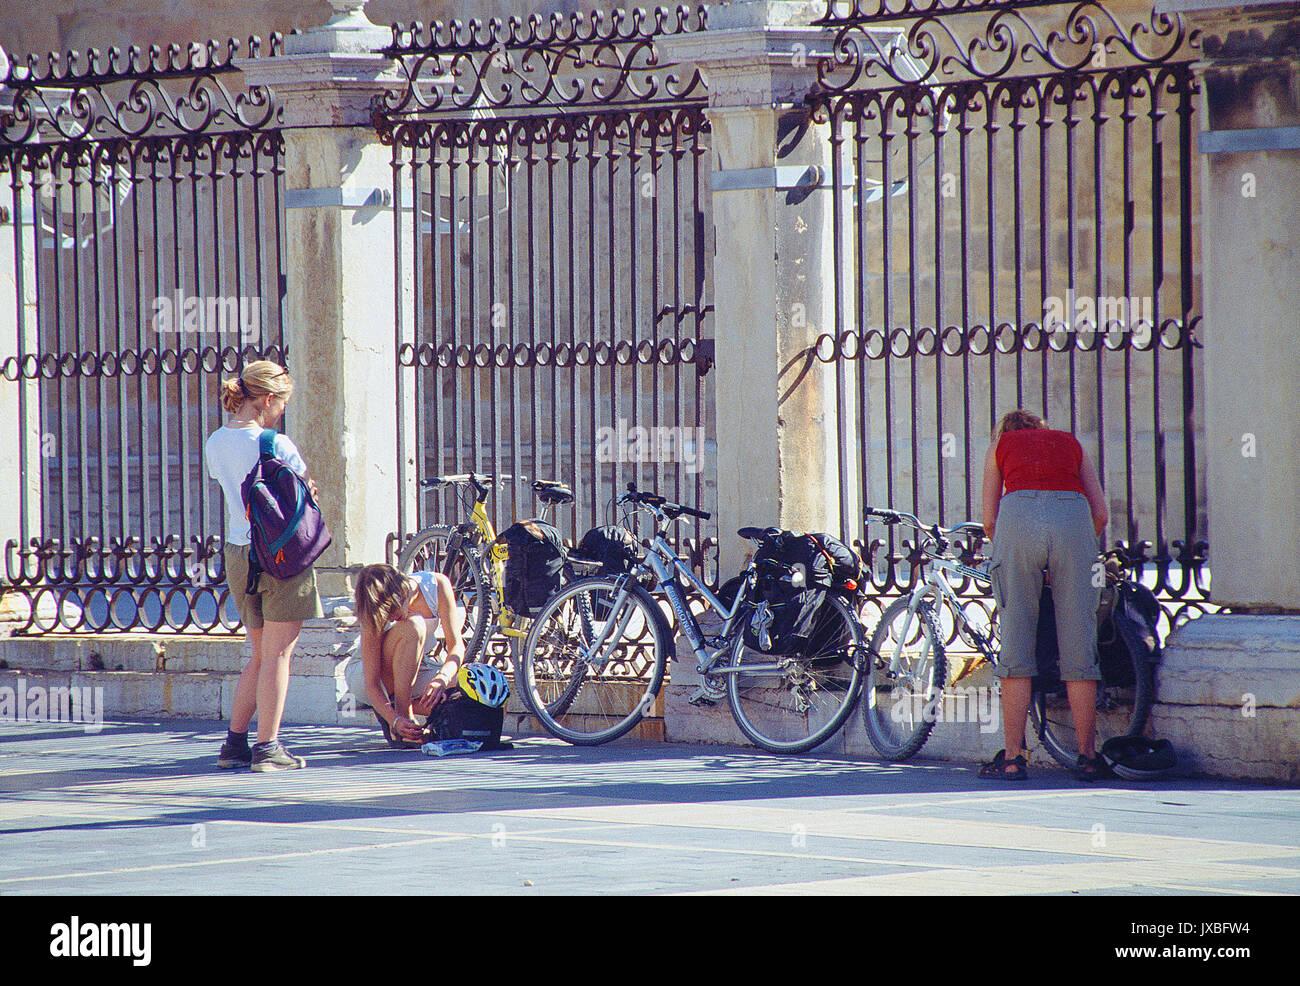 Three pilgrims by the cathedral. Leon, Castilla Leon, Spain. - Stock Image